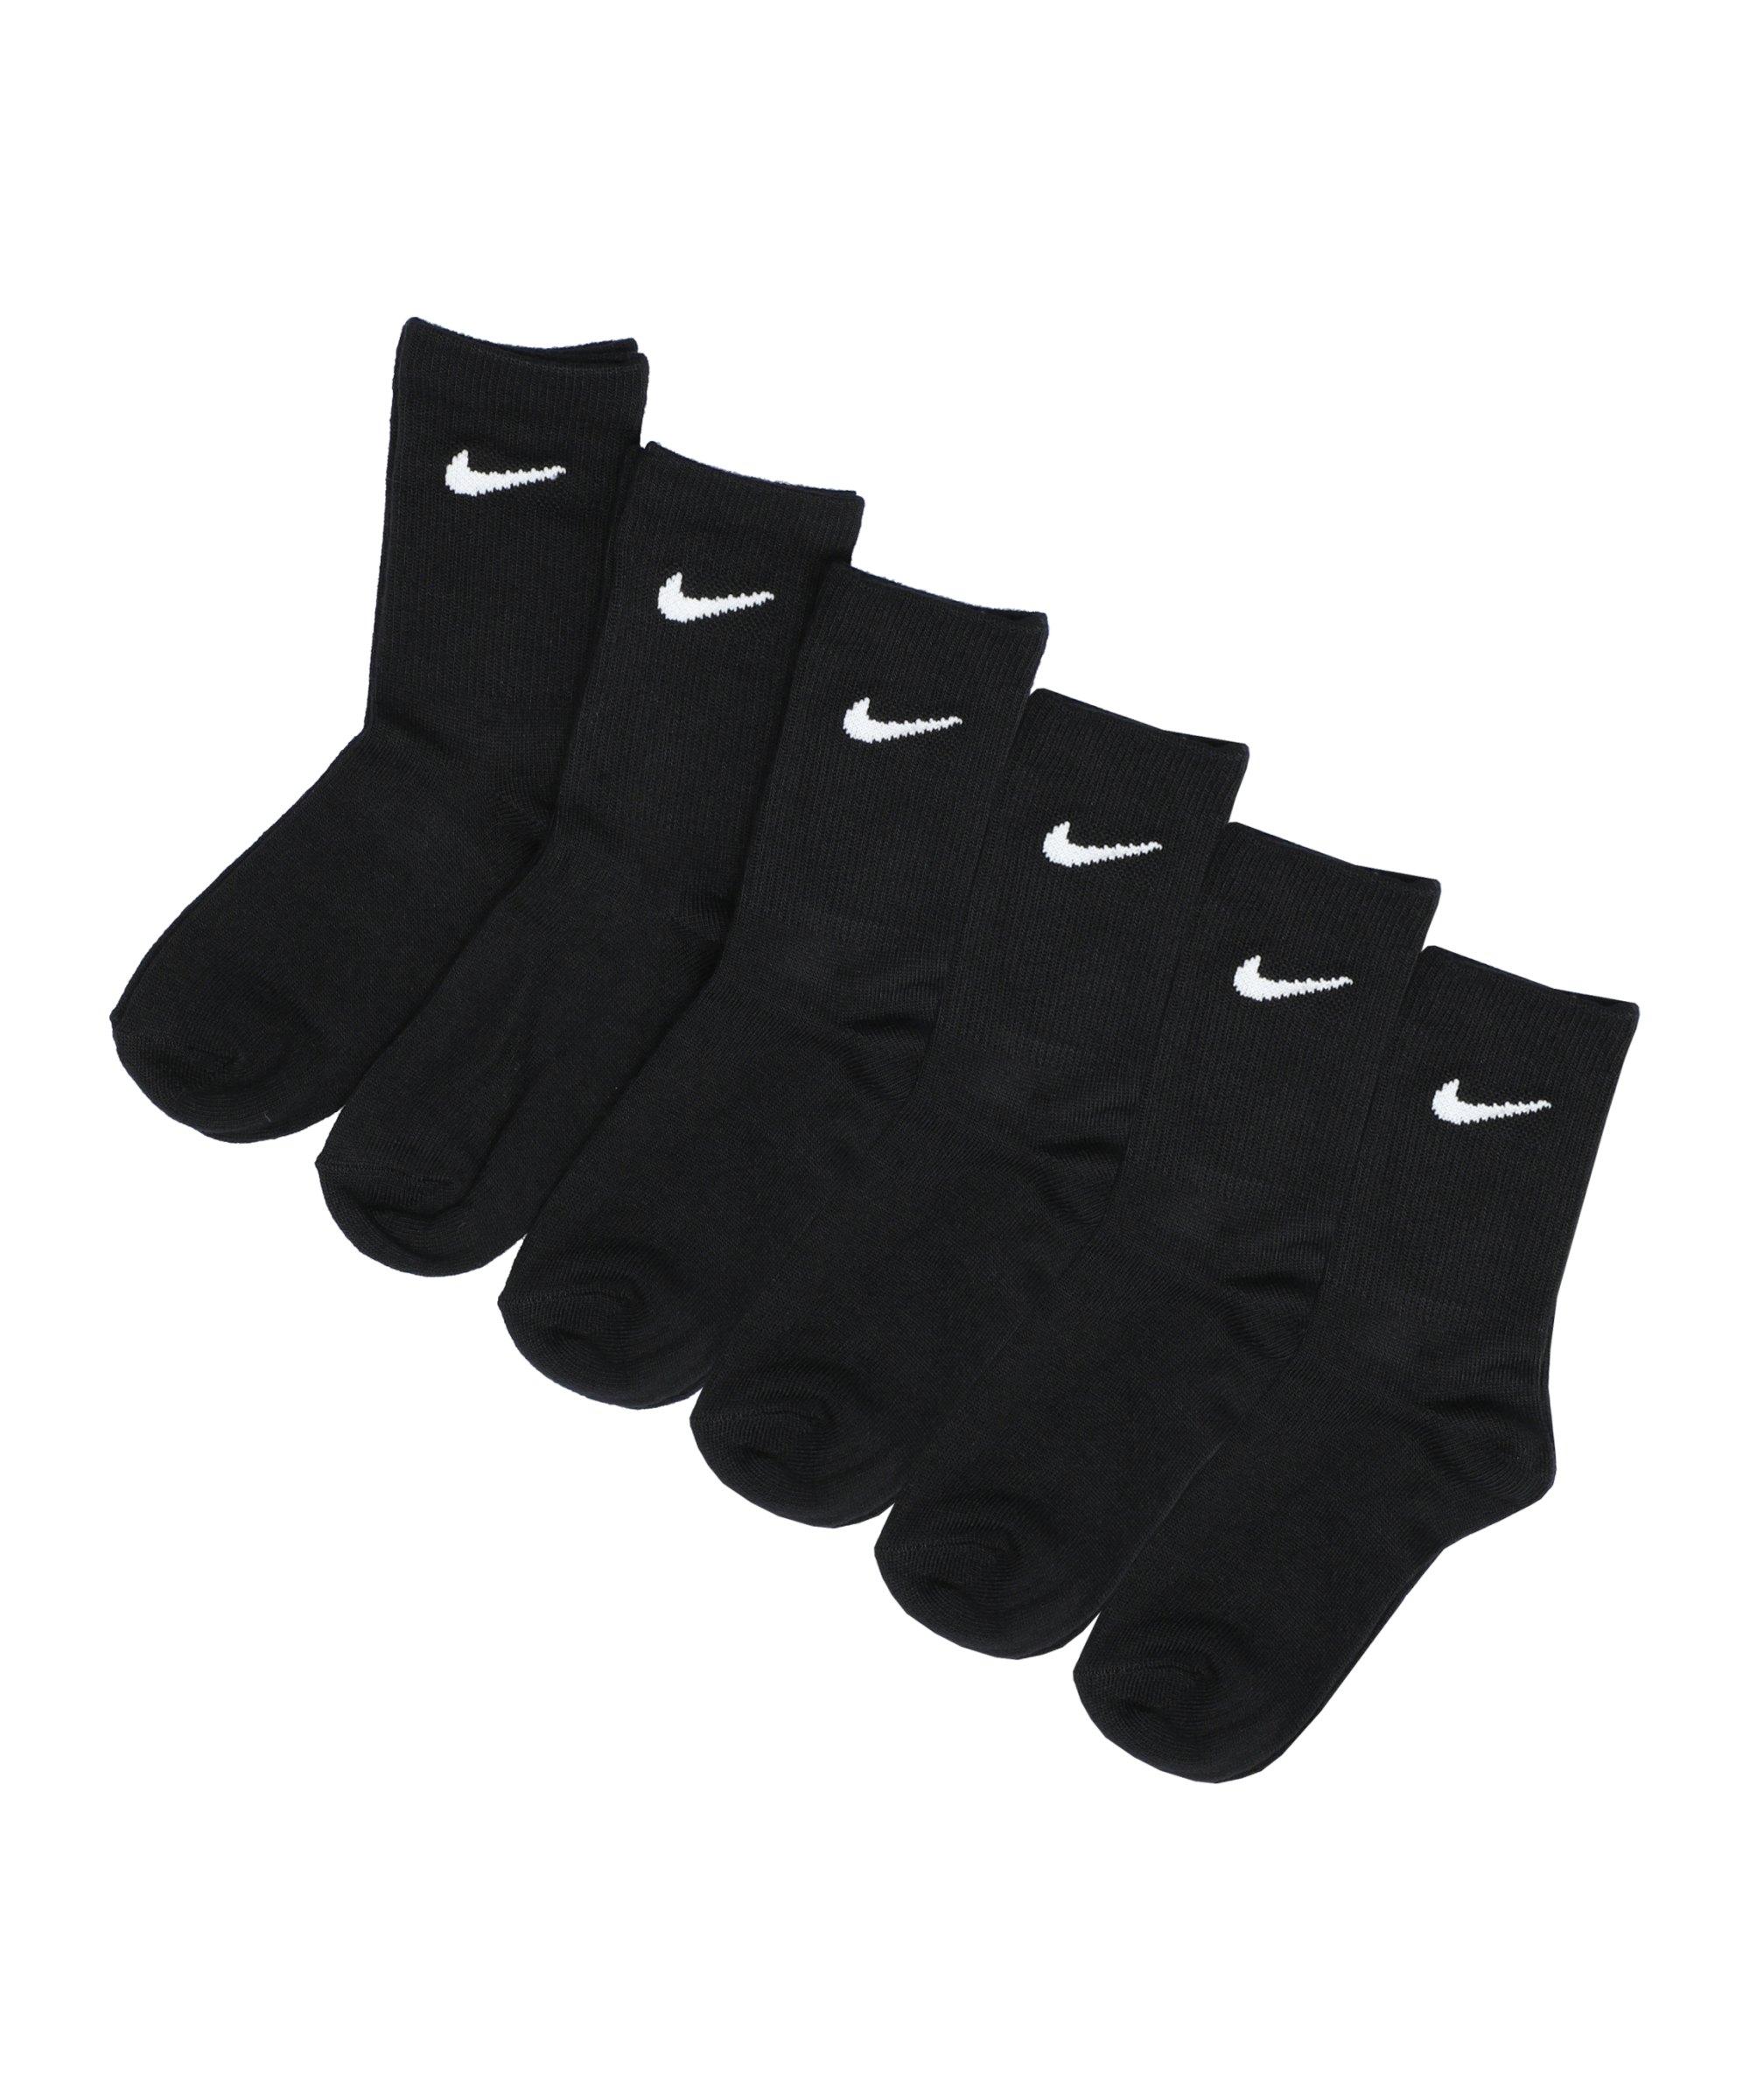 Nike Colorful Crew 6er Pack Socken Kids 5-7 F023 - schwarz